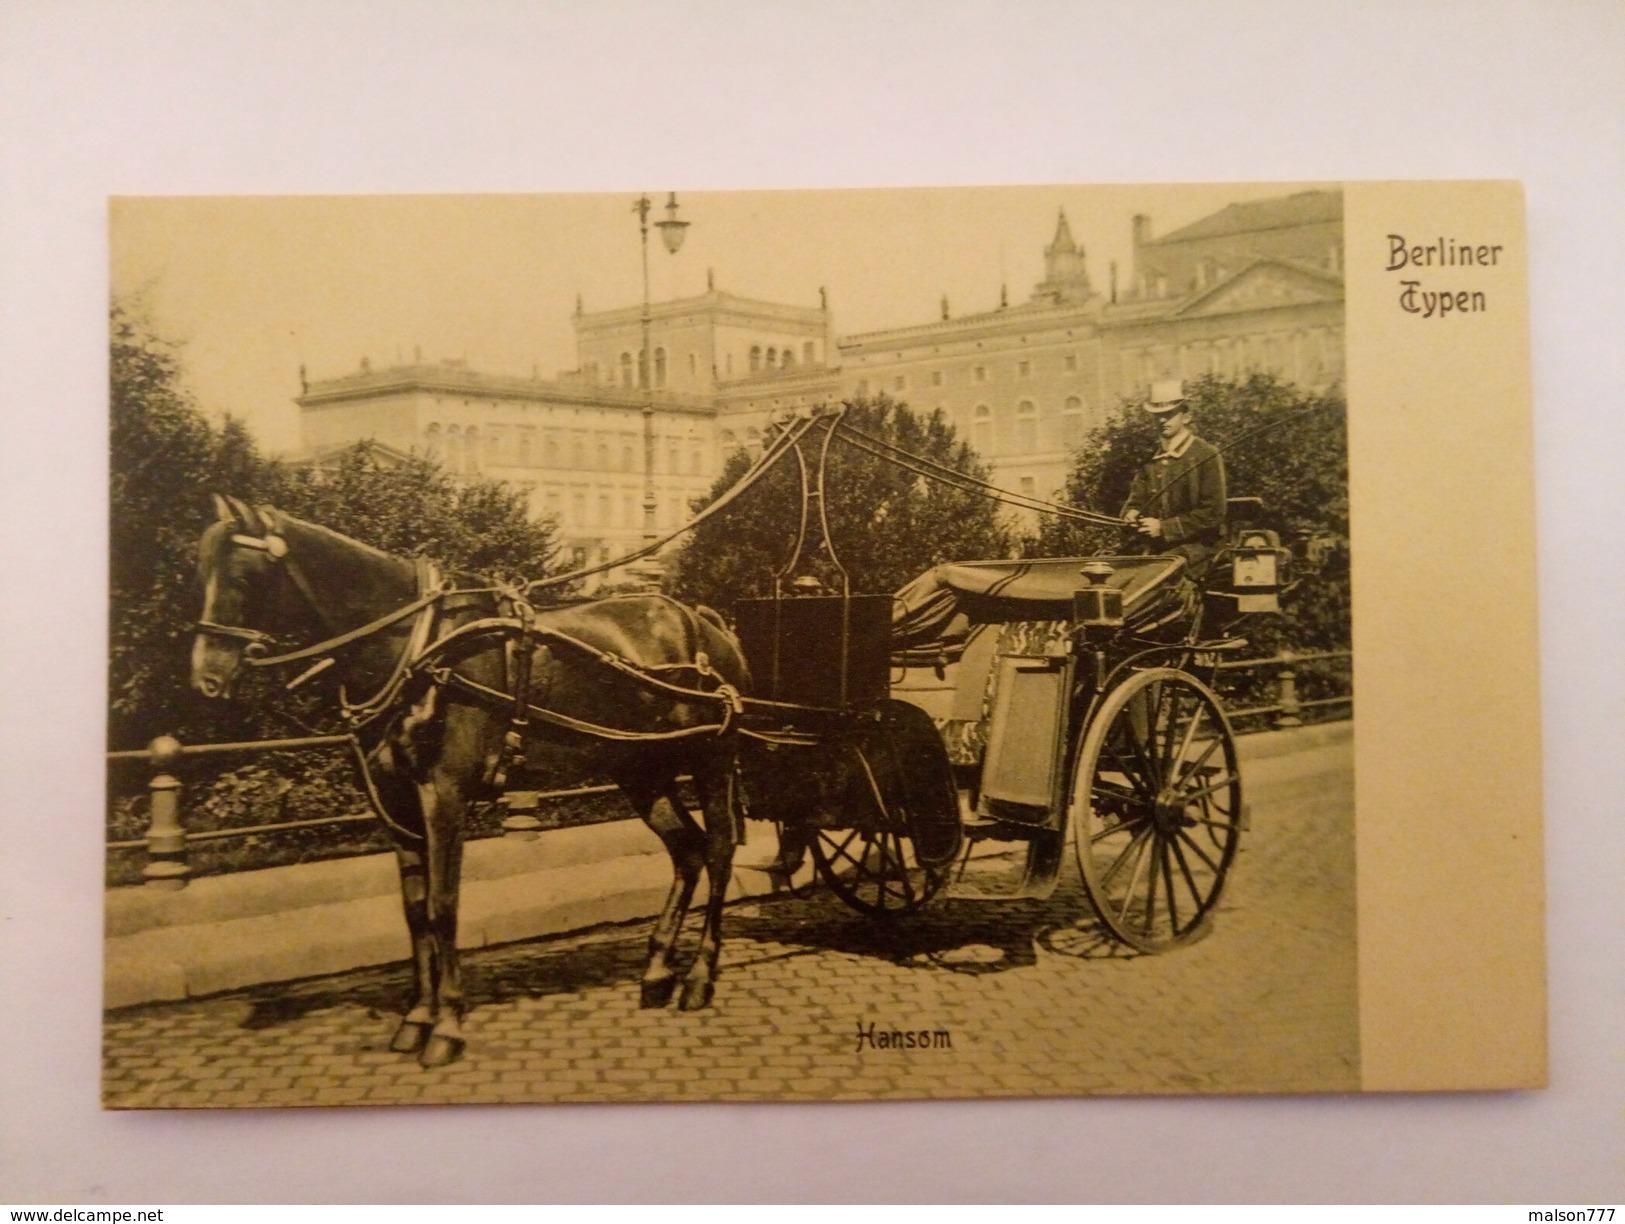 Berliner Typen Hansom Cab - Taxi & Carrozzelle